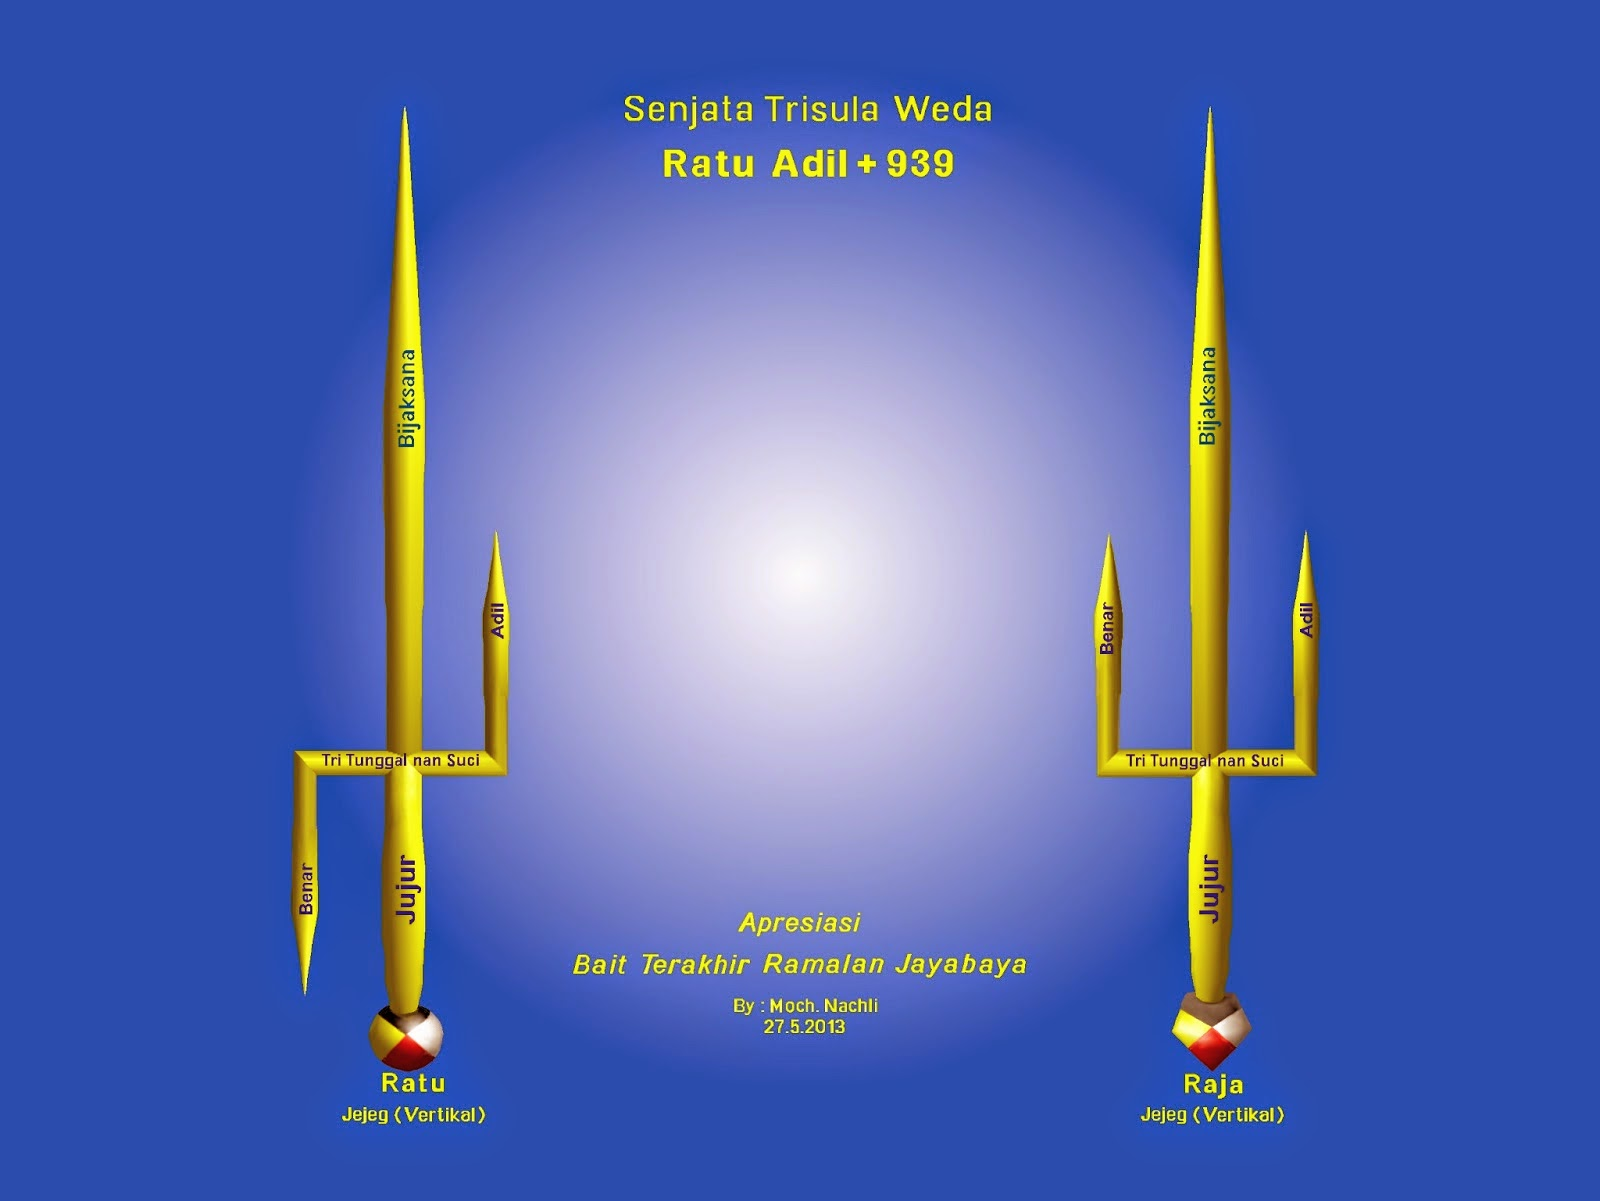 Trisula Weda, Ratu Adil